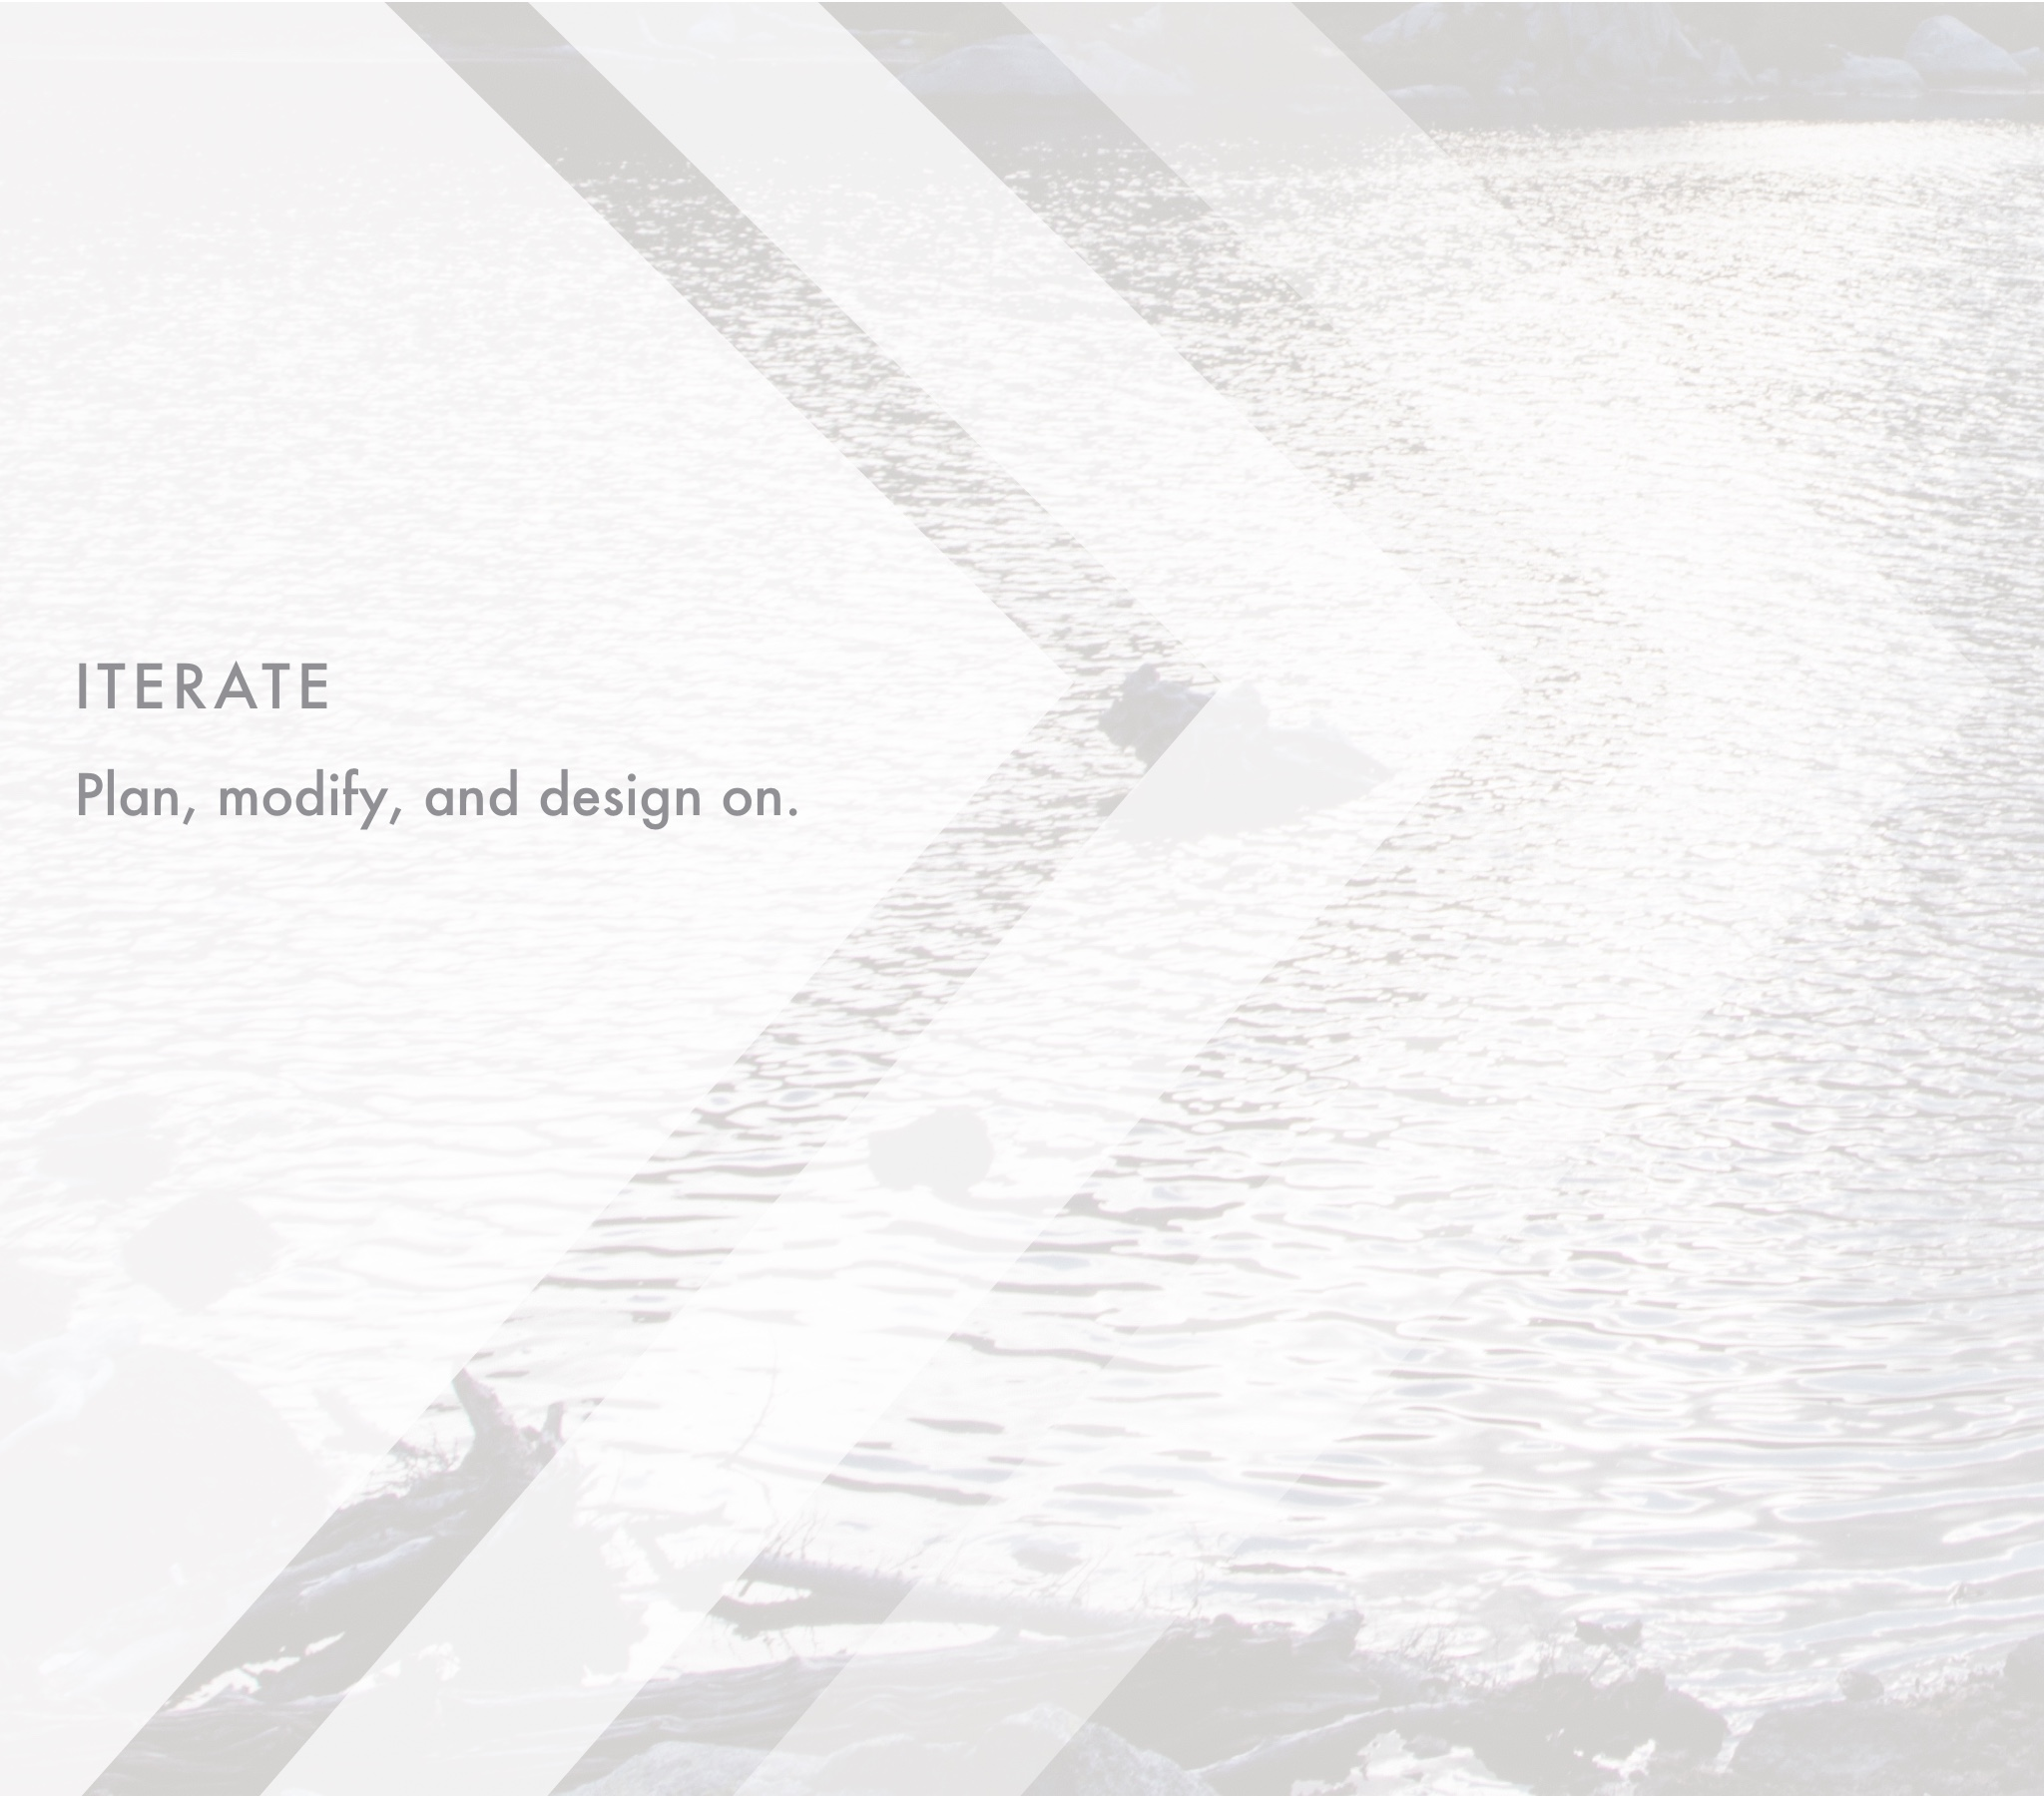 Iterate.jpg